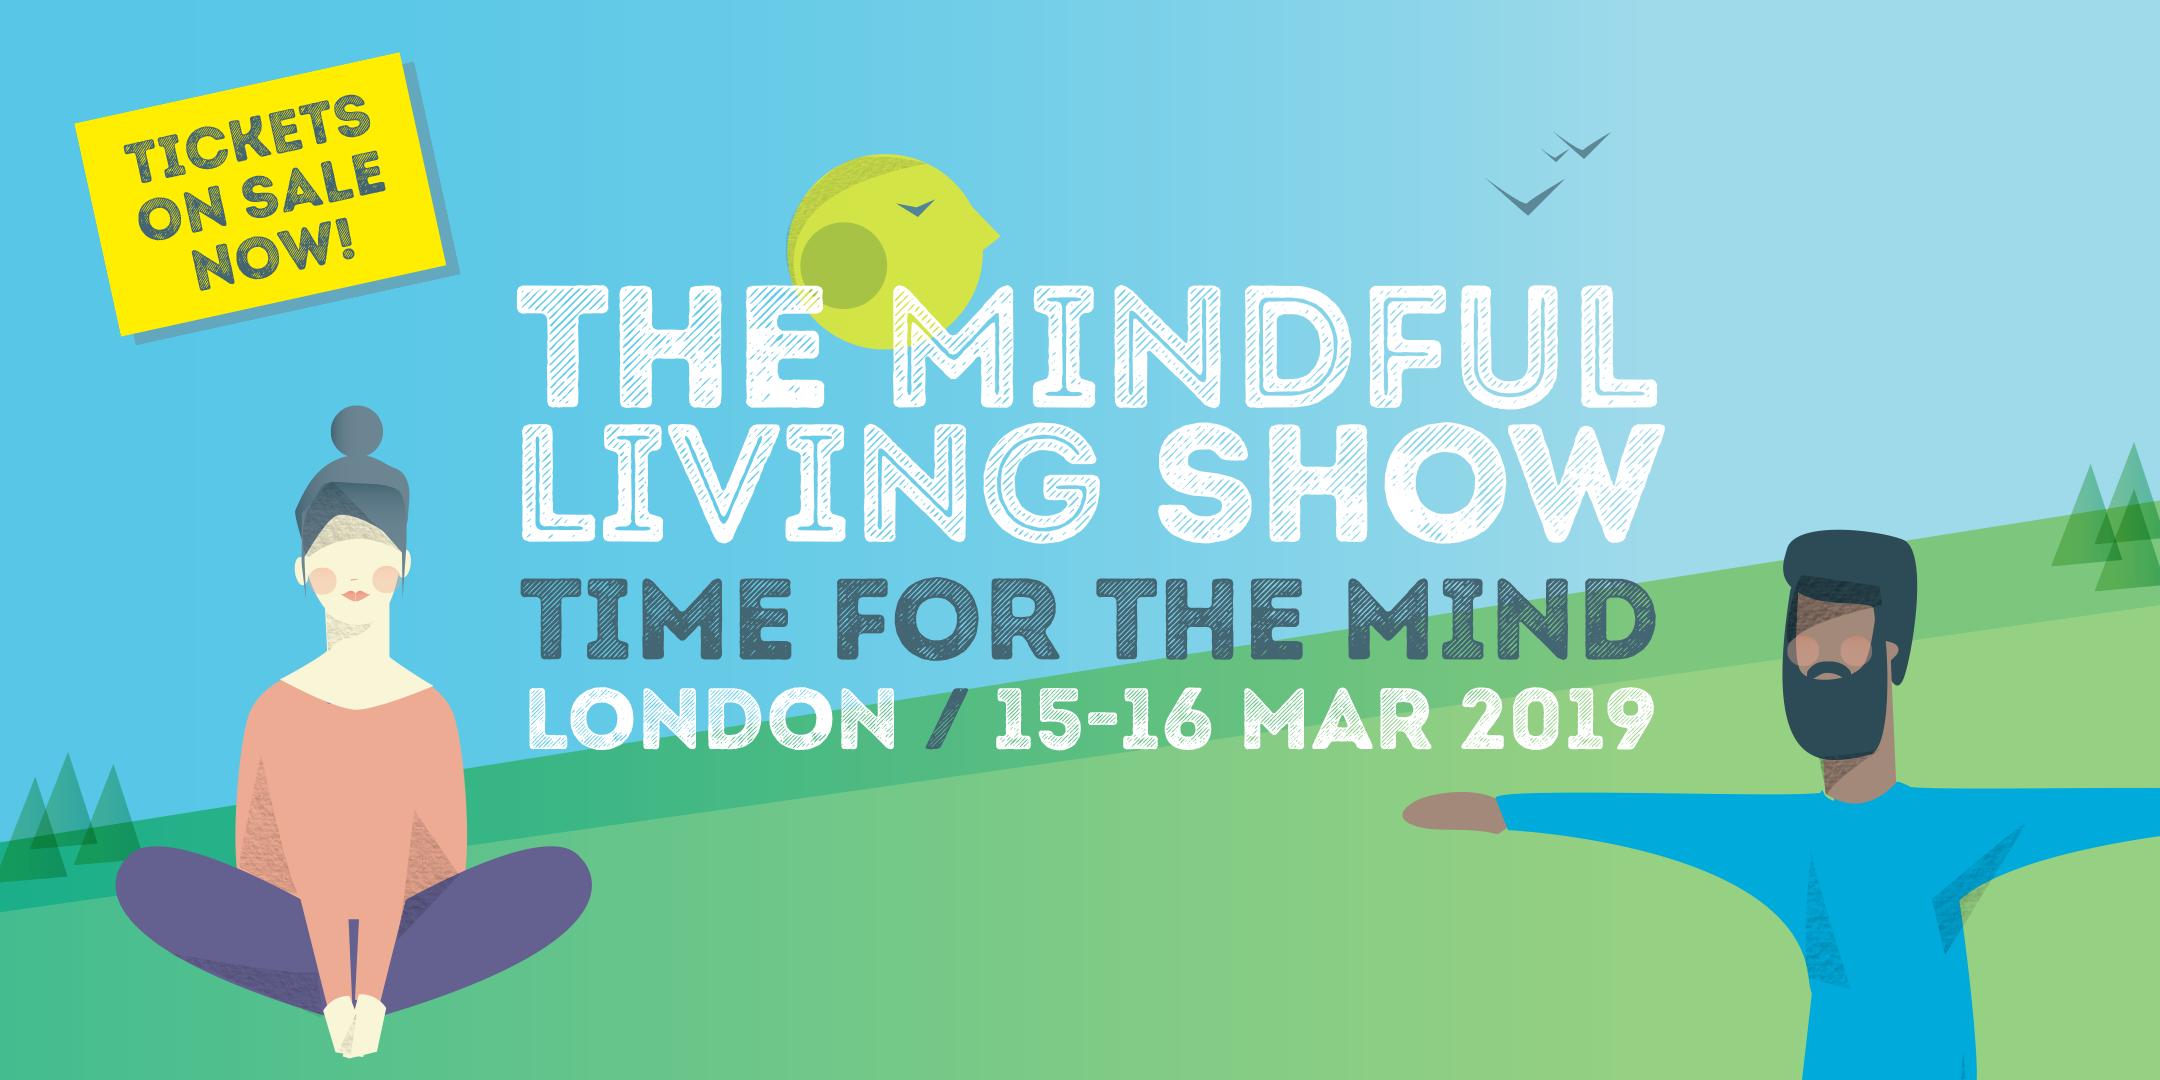 Mindful Living Show 2019